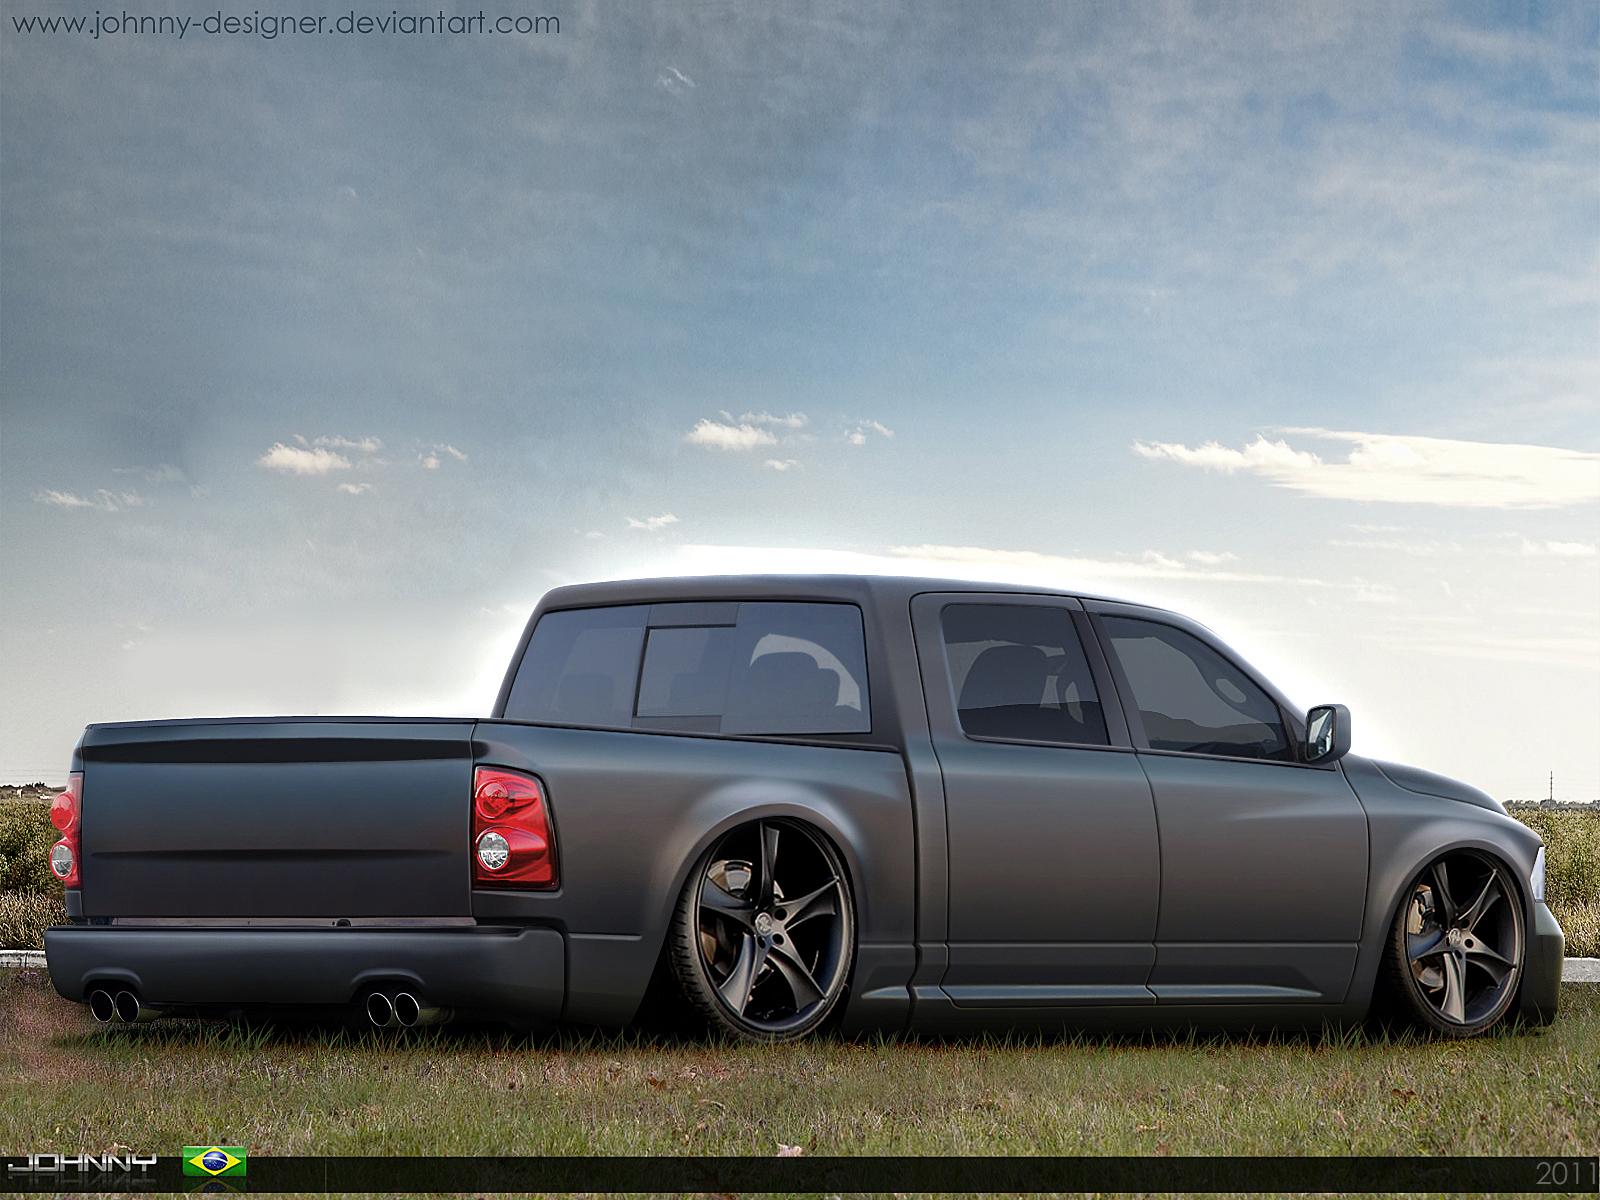 Dodge Ram 1500  Fosco by Johnny-Designer